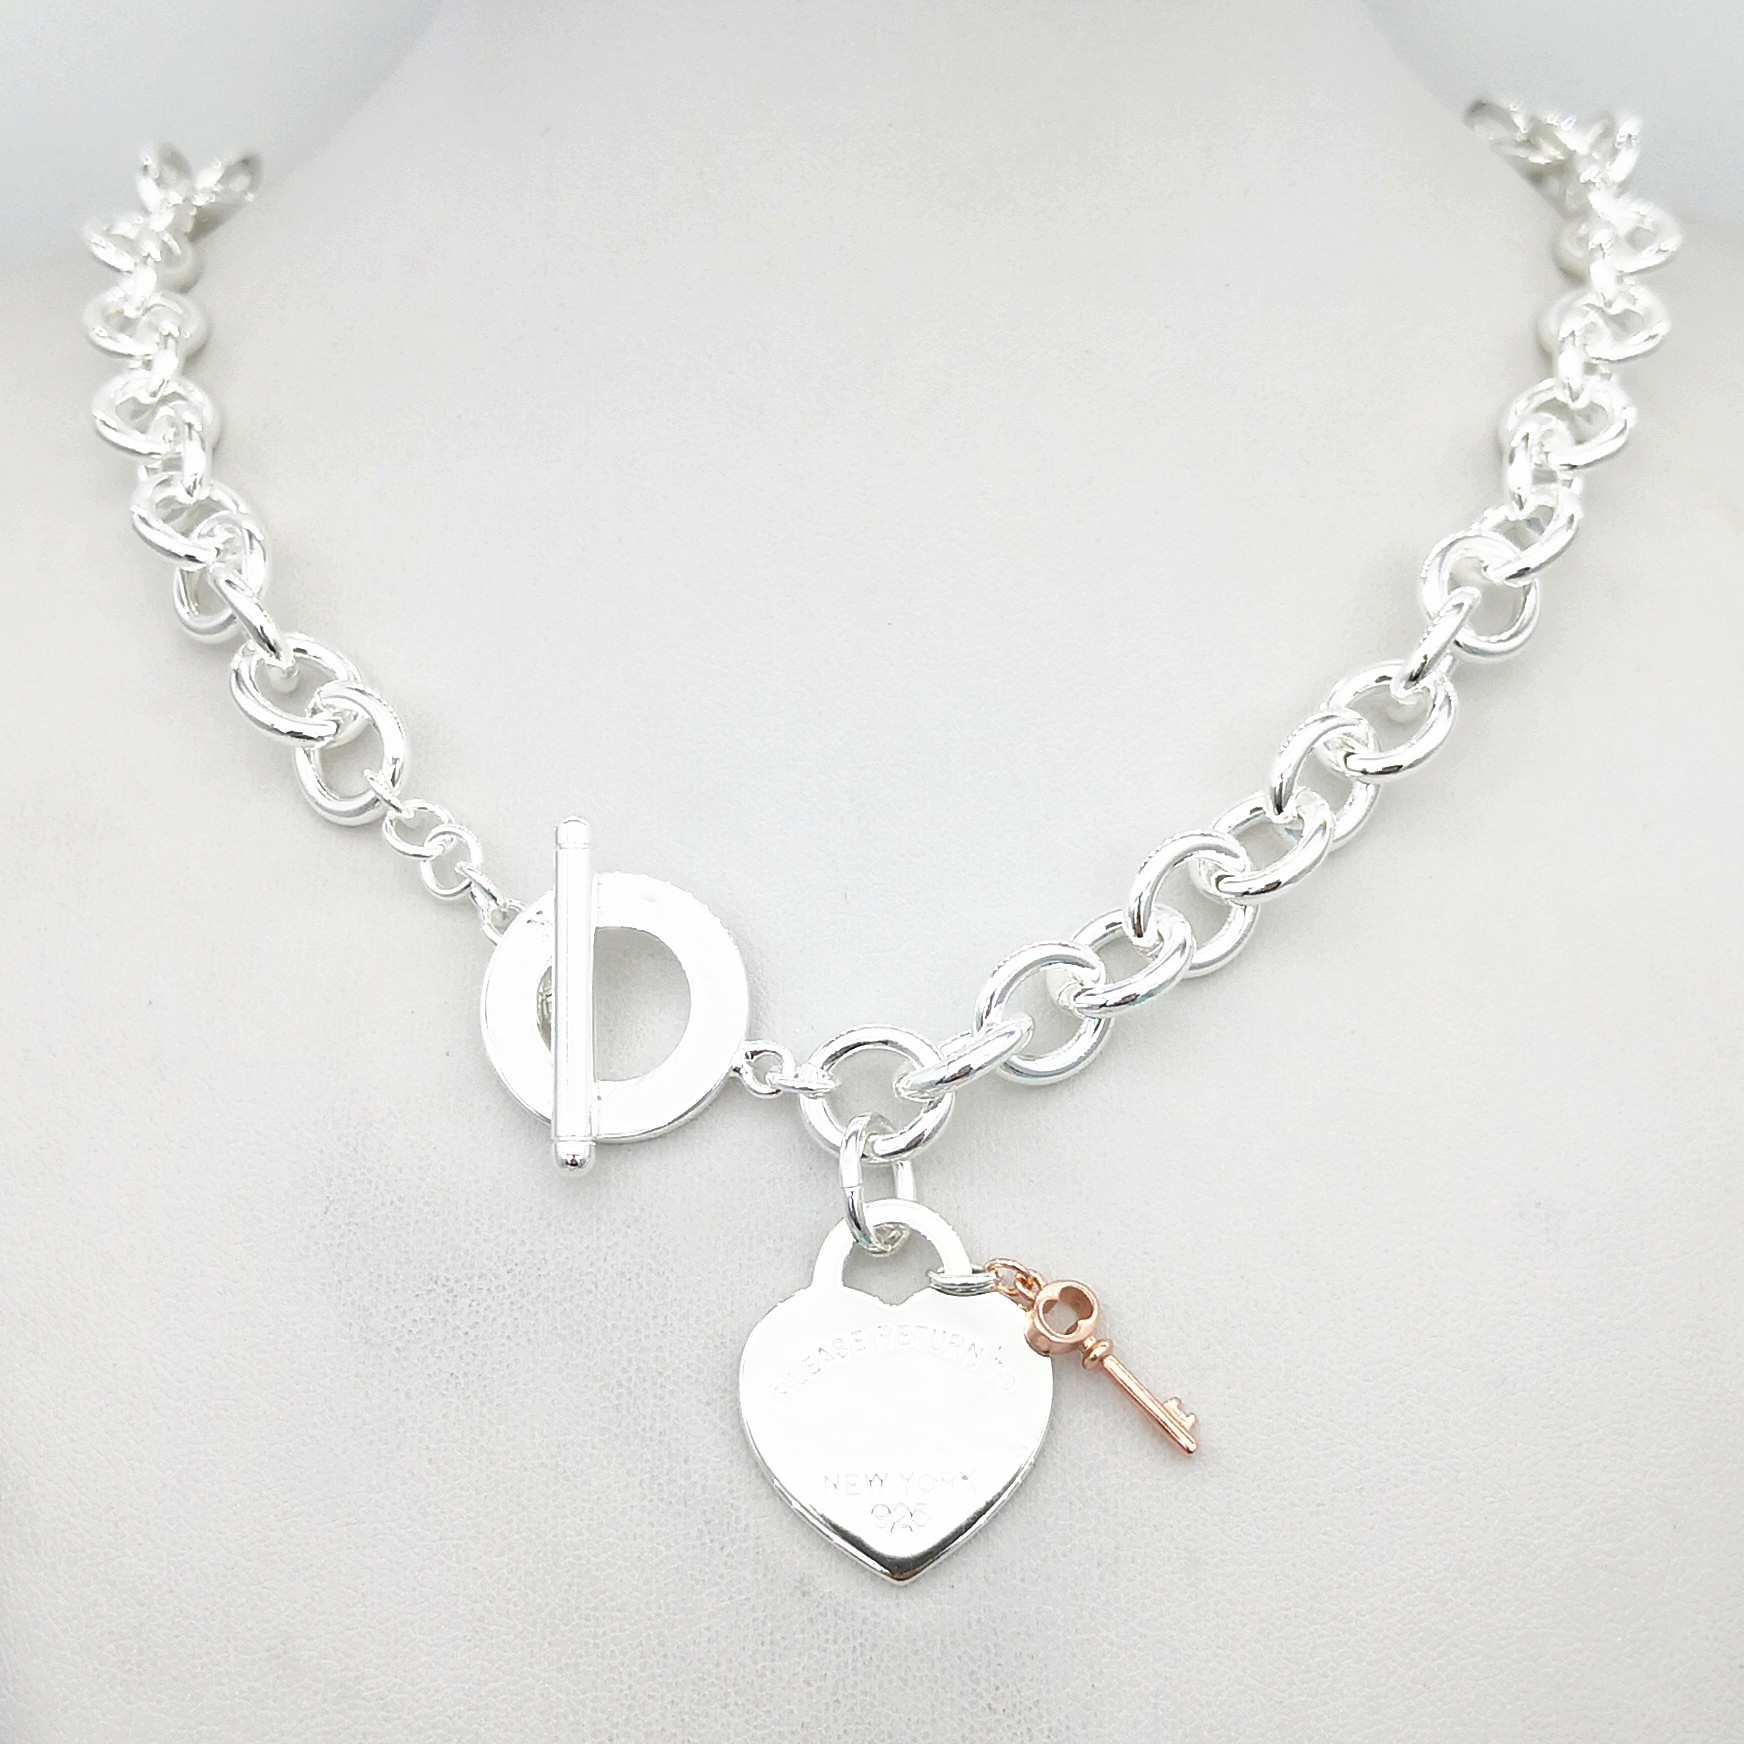 Sterling Silver Key Charm